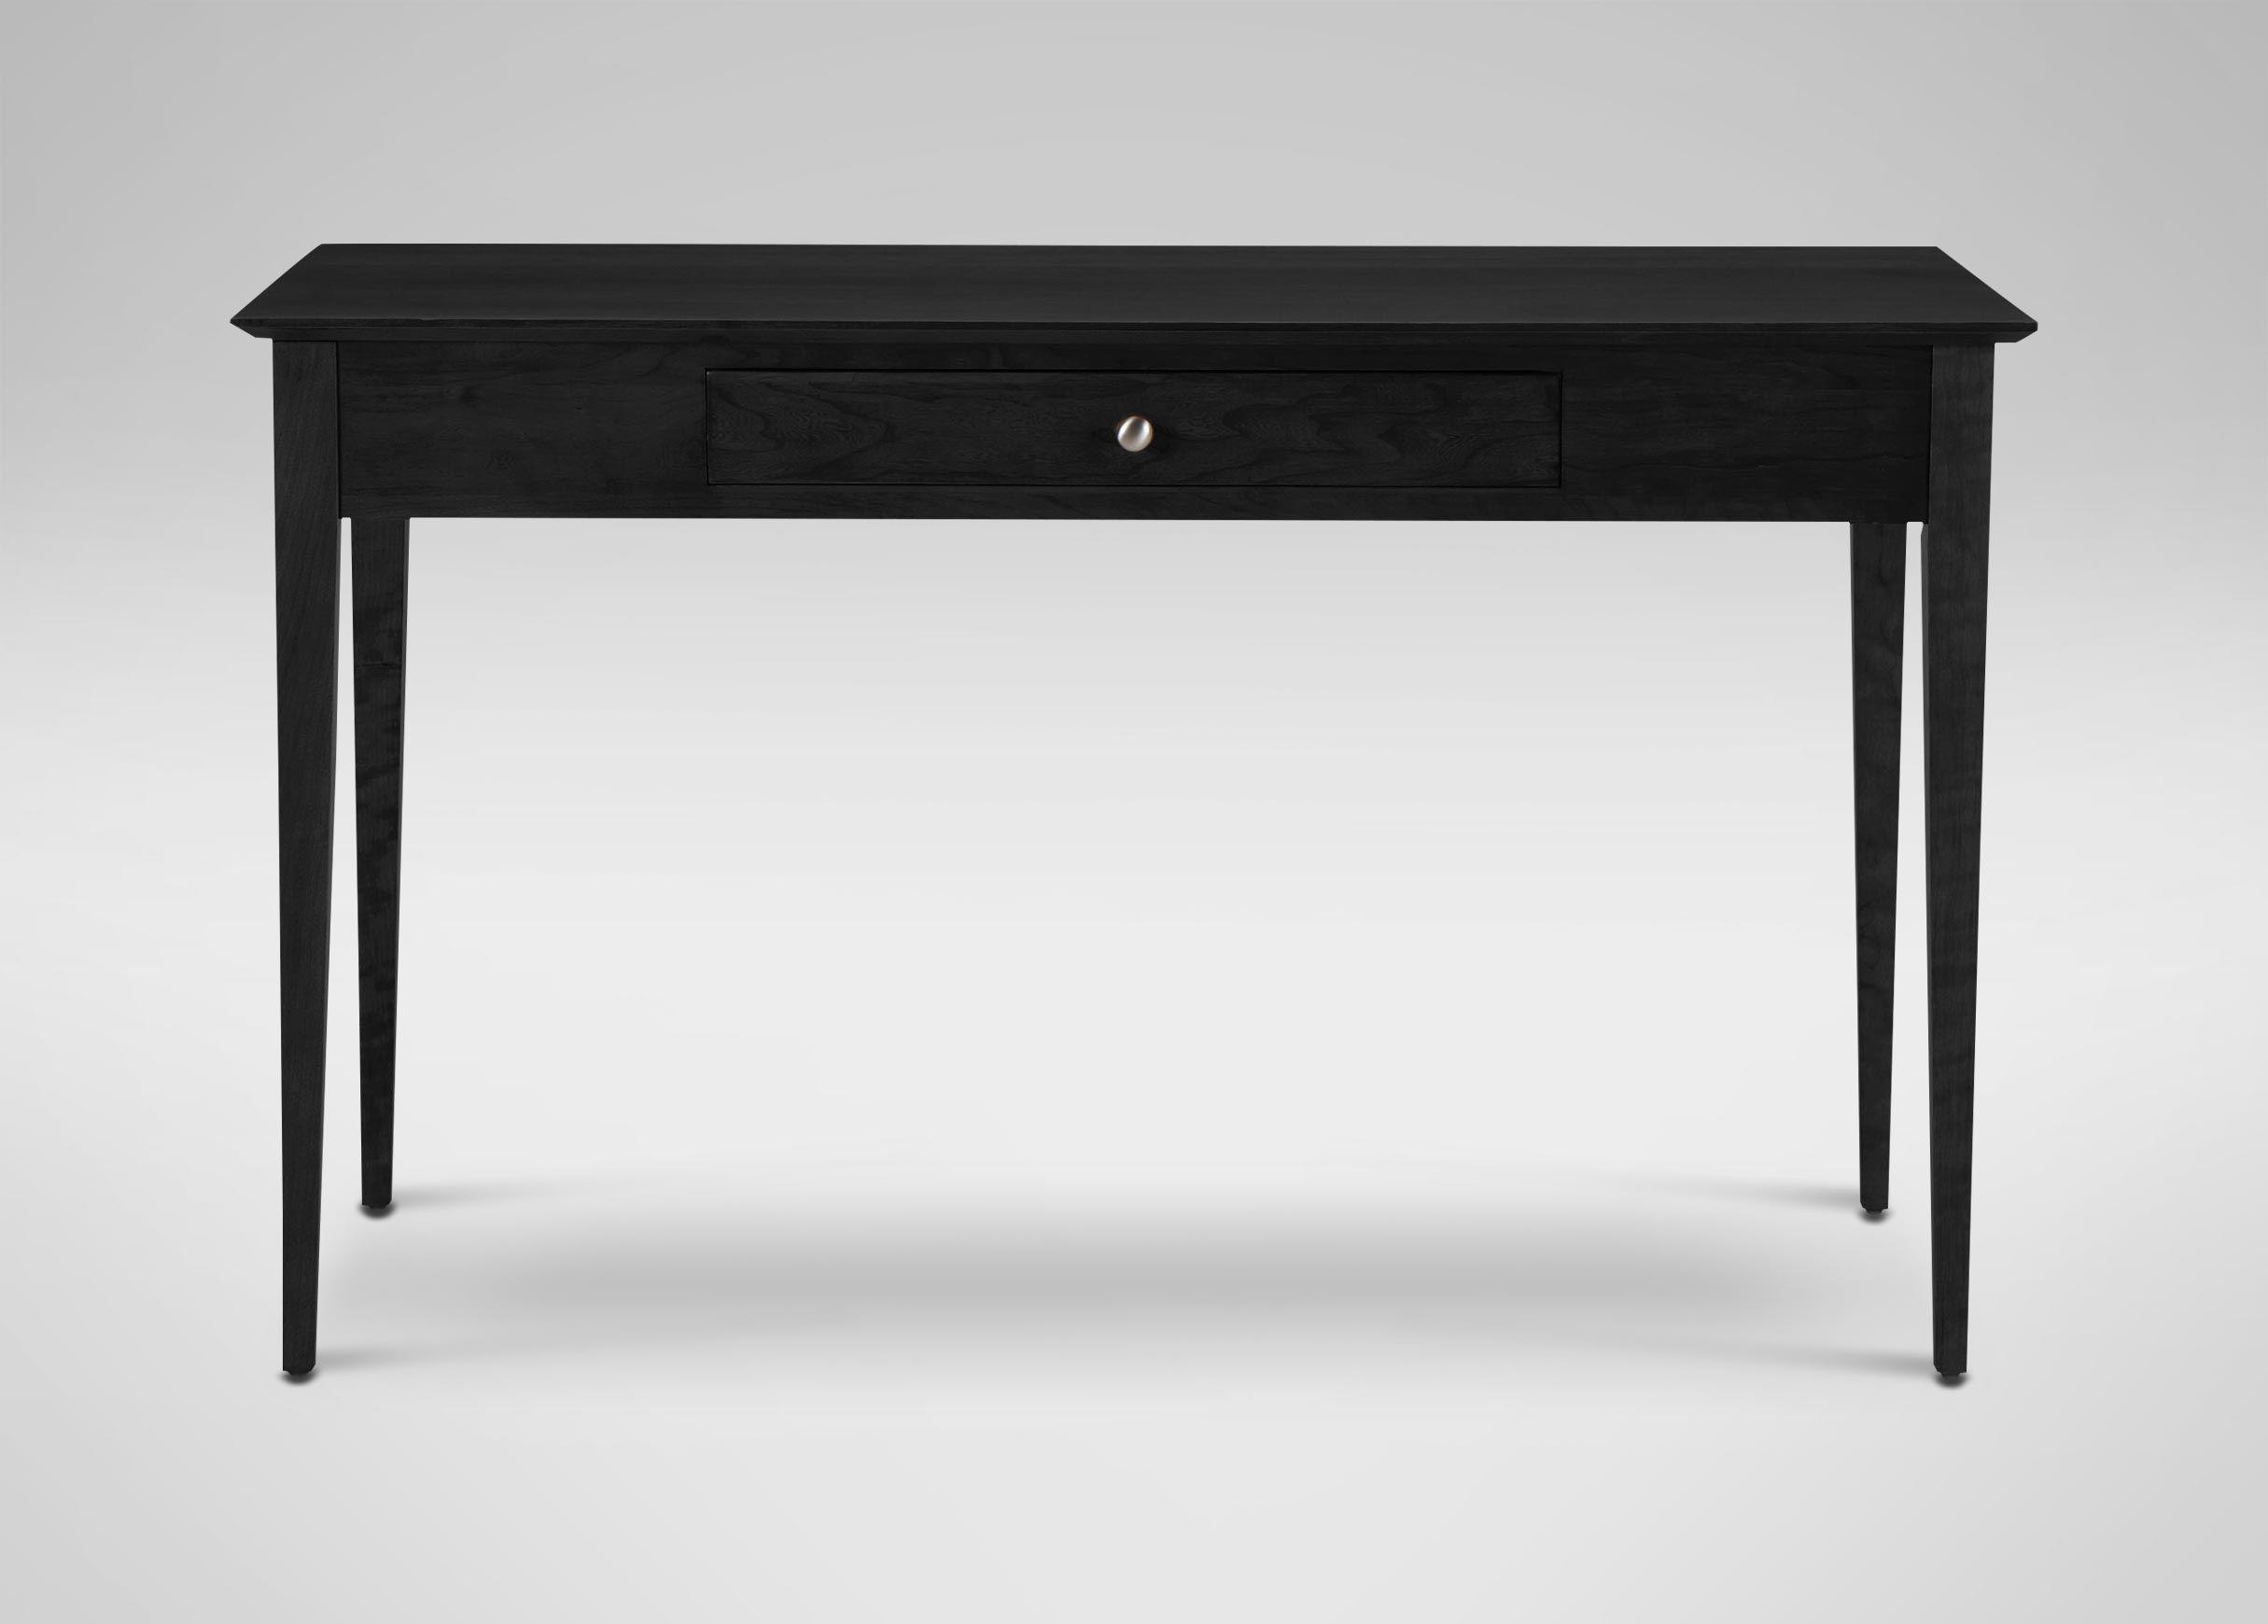 Rowan Sofa Table Desk Ethan Allen Sofa Table Living Room Console Table Desk